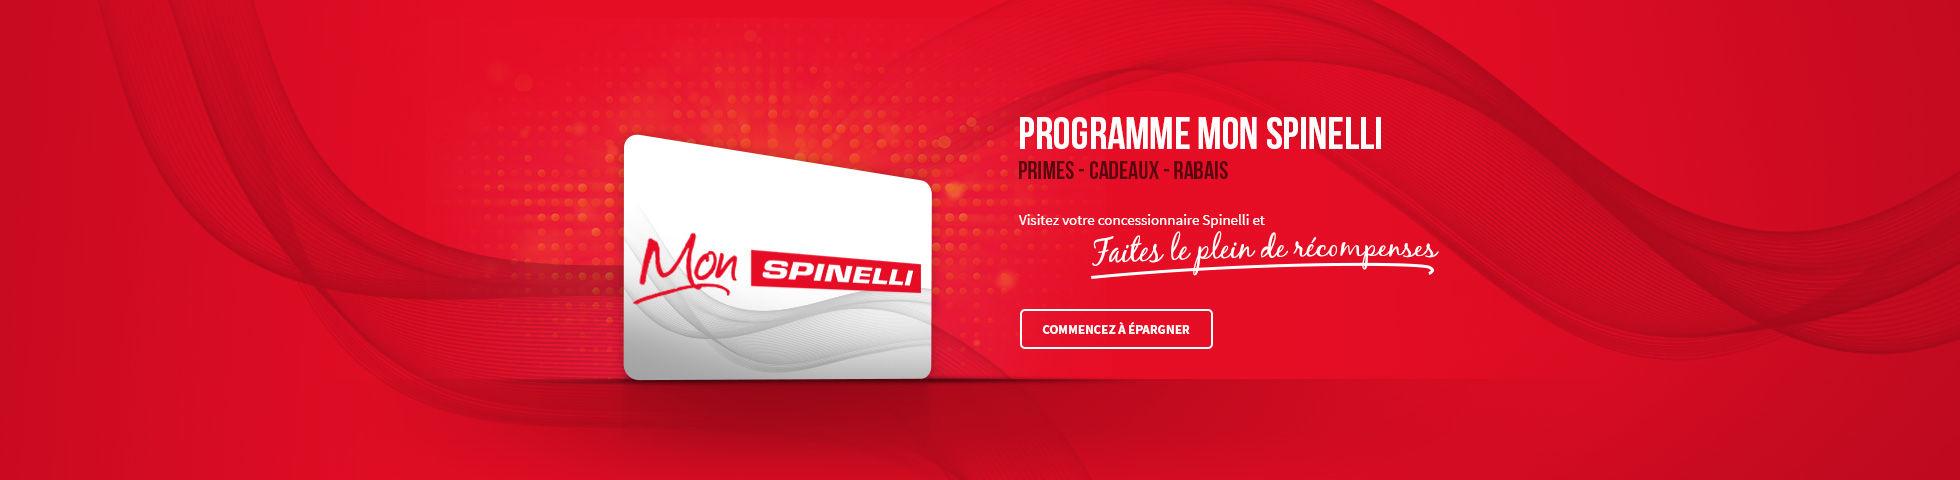 Programme Mon Spinelli